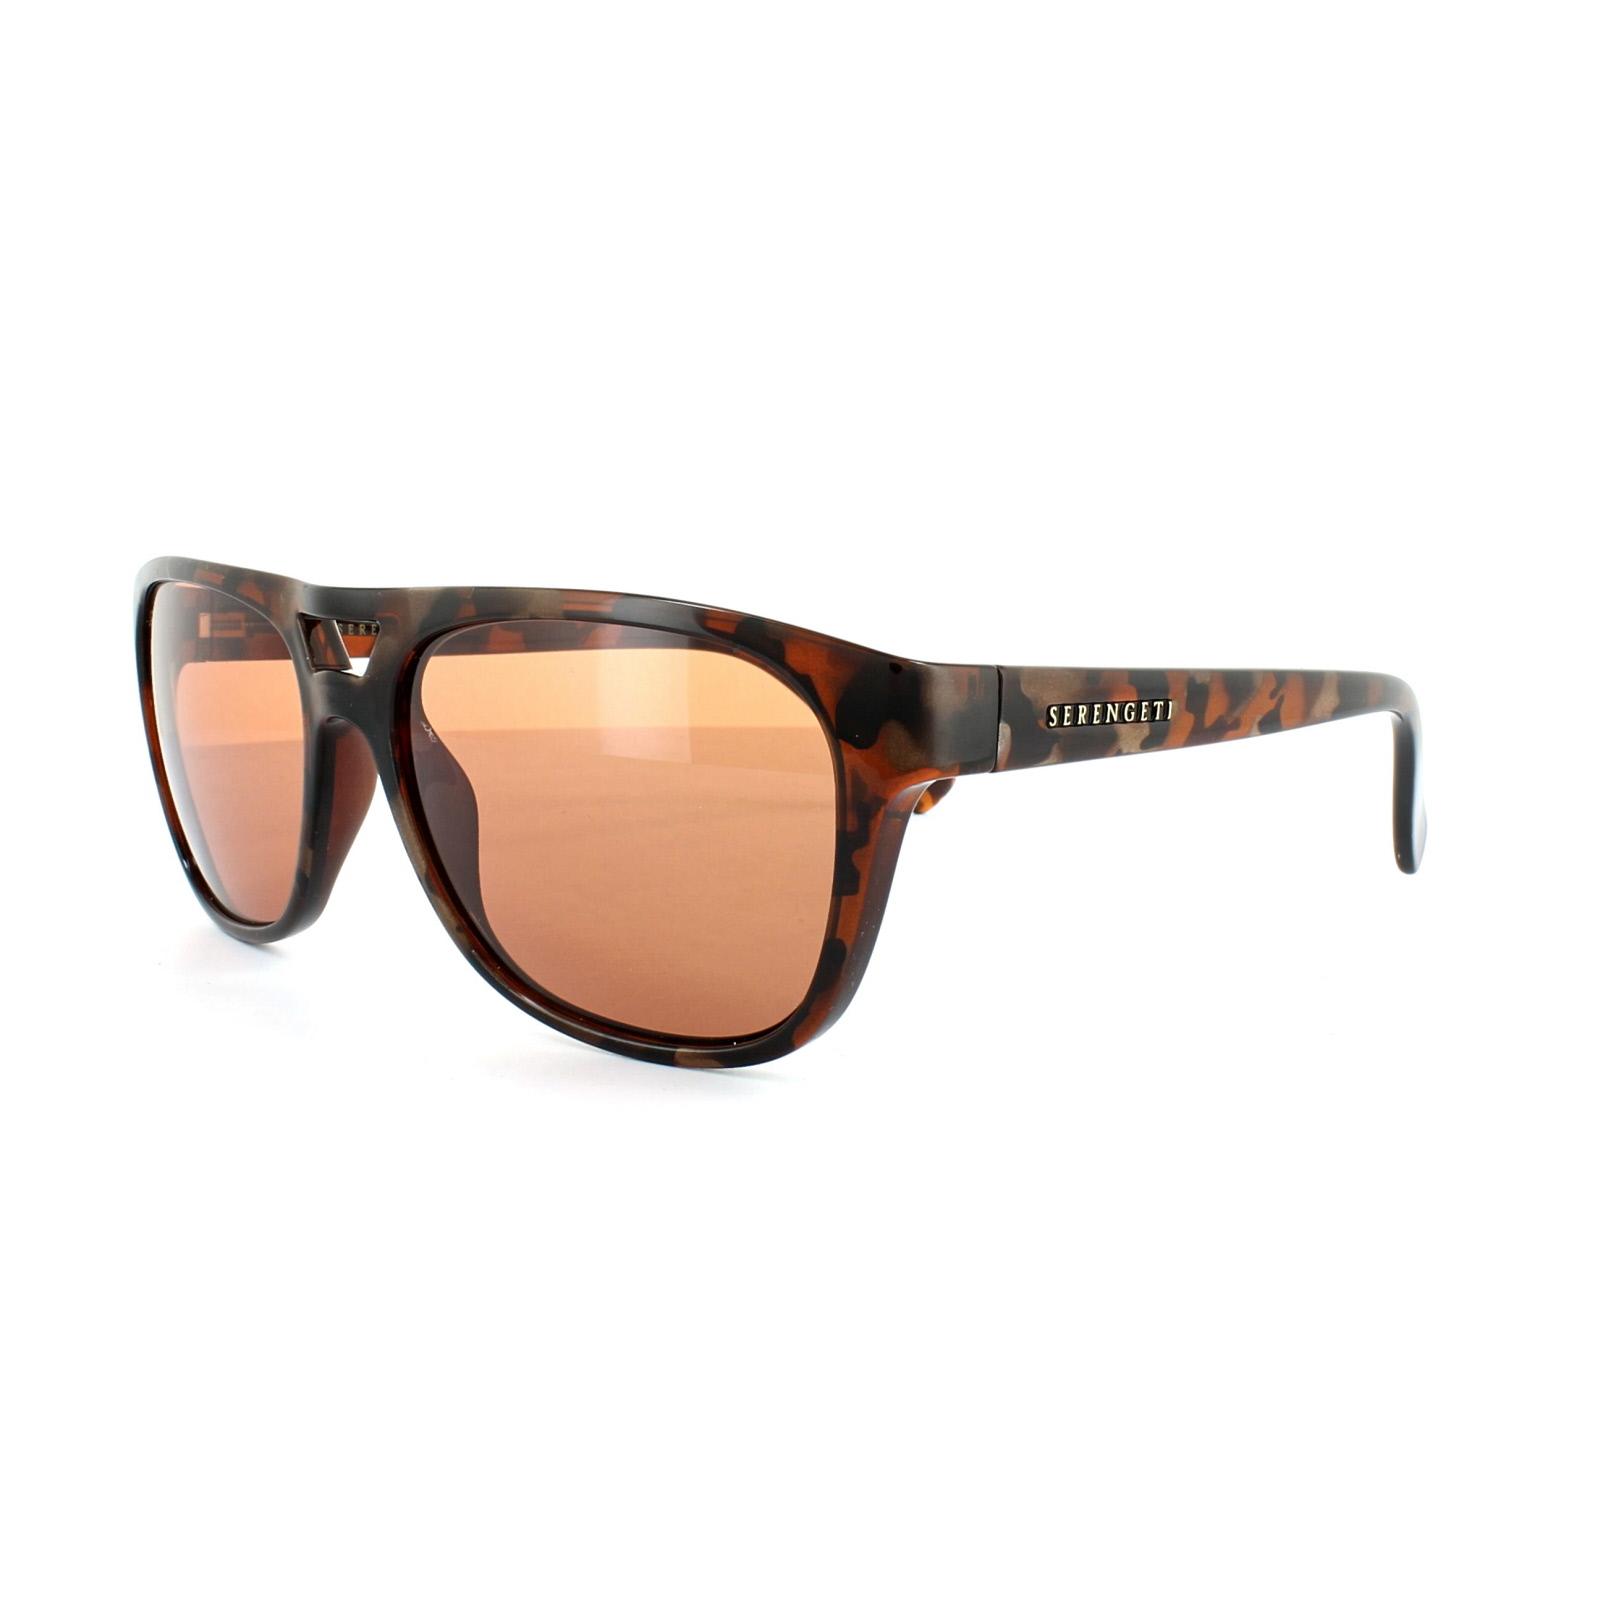 5c79cf805ce00 Cheap Serengeti Sunglasses - Discounted Sunglasses